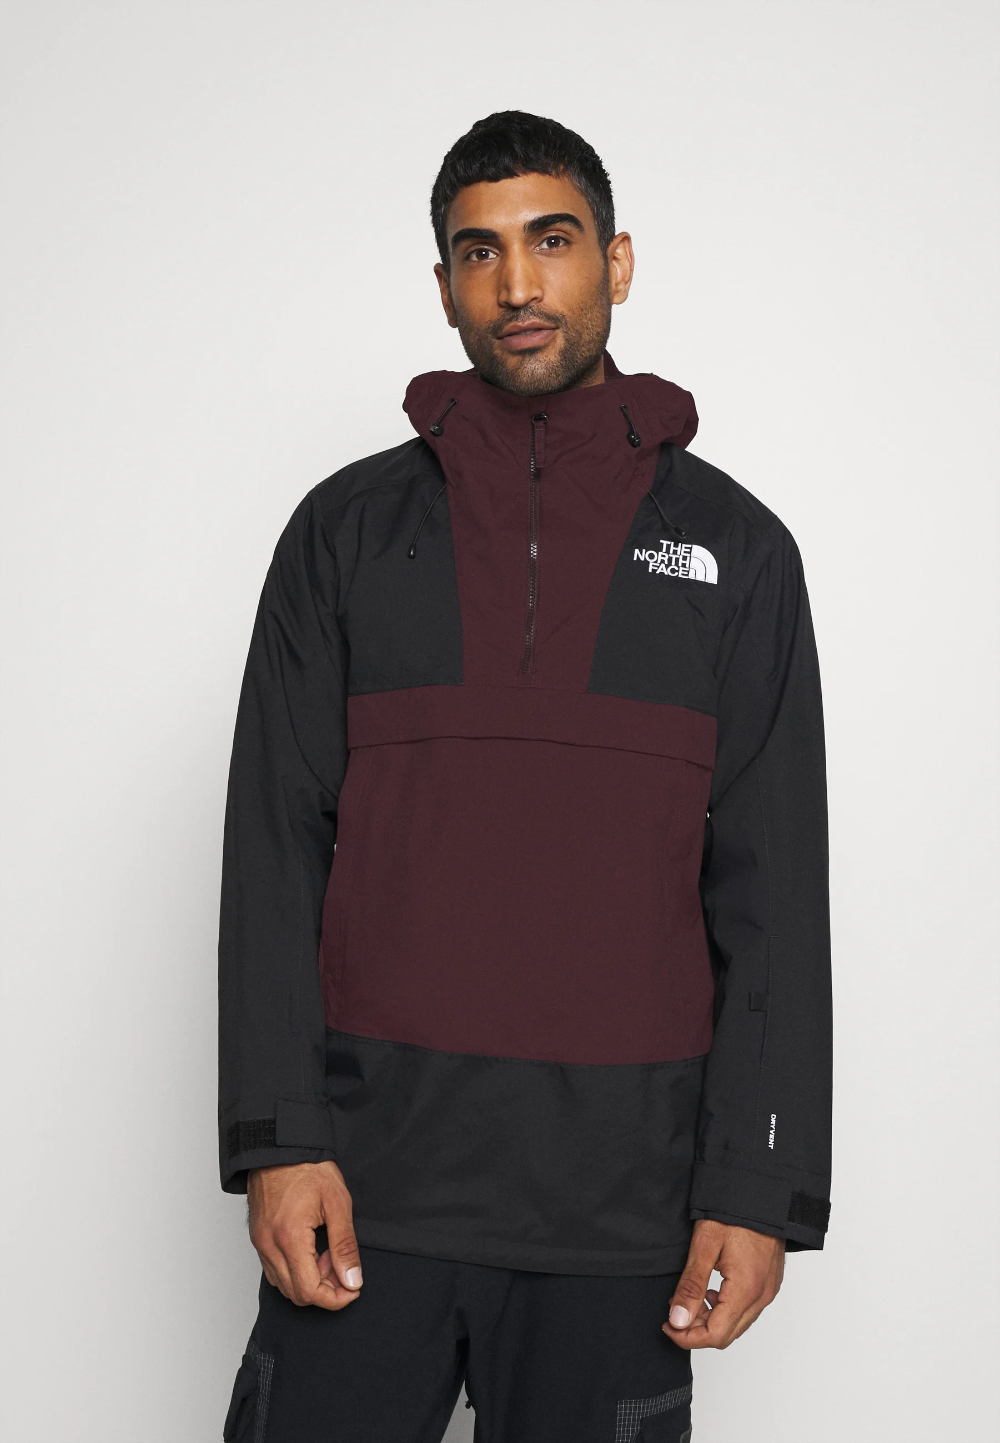 The North Face Silvani Anorak Ski Jacket Burgundy Black Burgundy Zalando No The North Face Ski Jacket Anorak [ 1443 x 1000 Pixel ]